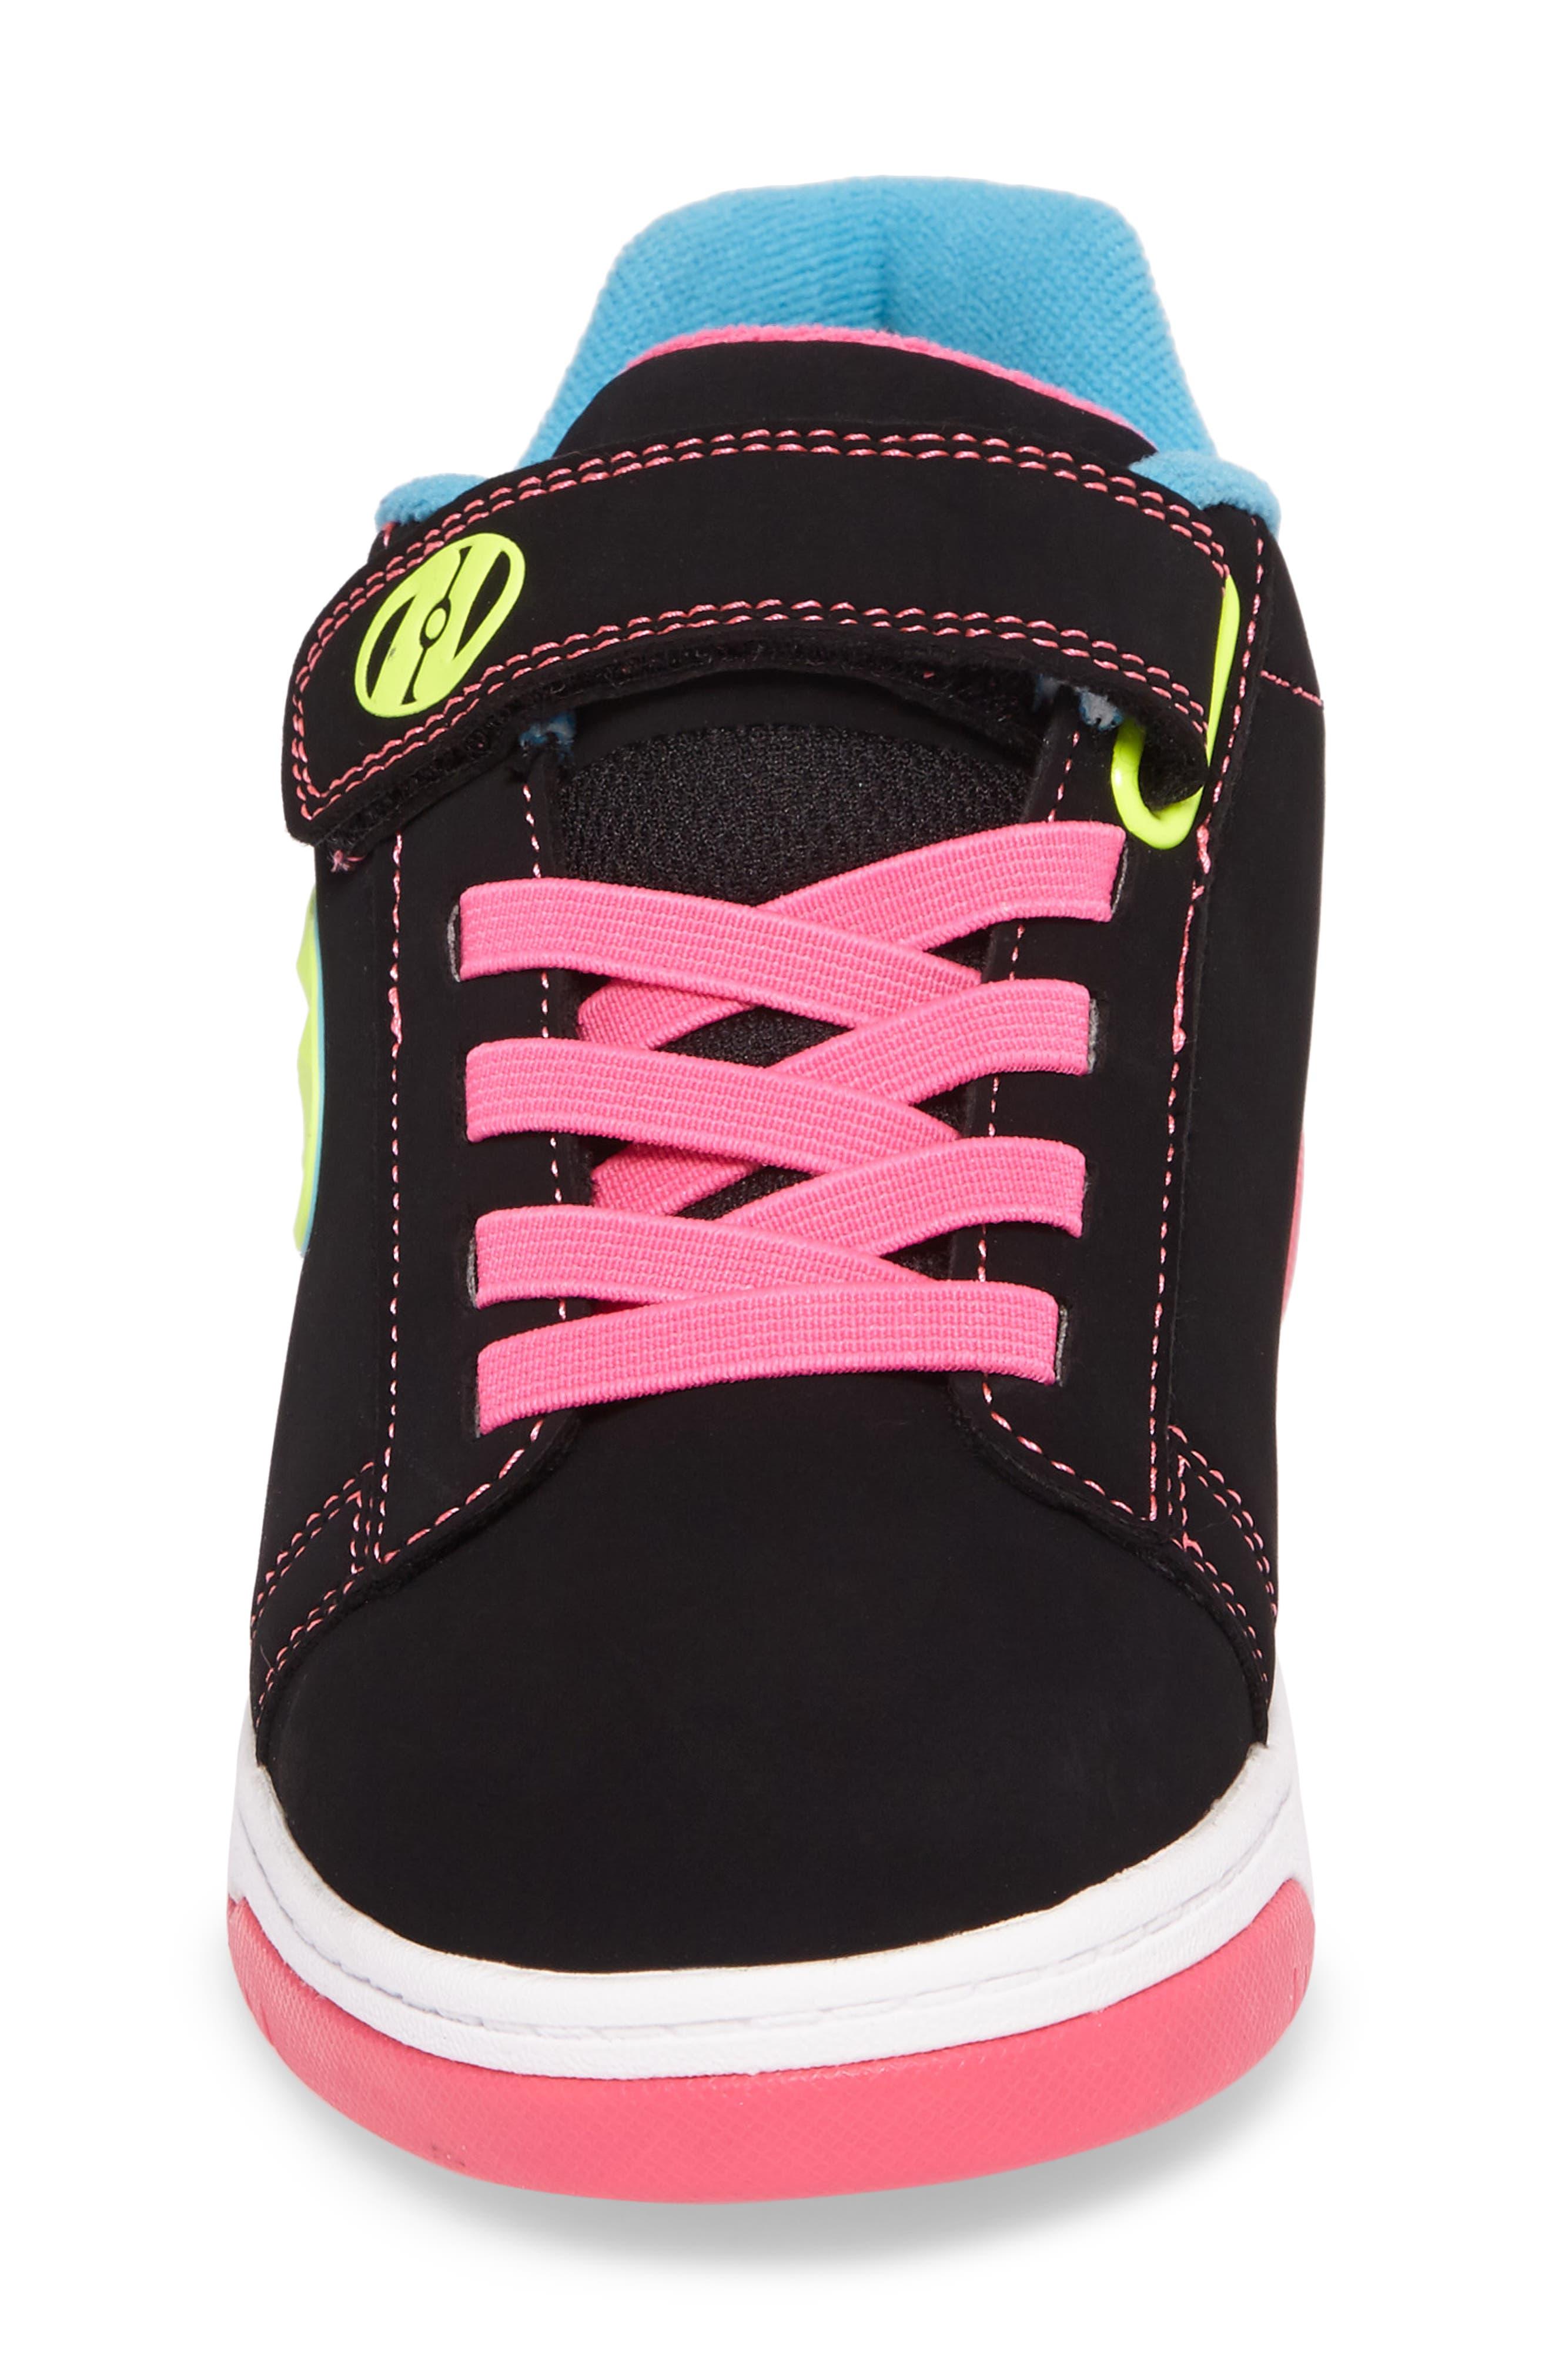 Dual Up Wheeled Skate Sneaker,                             Alternate thumbnail 4, color,                             Black/ Neon Multi